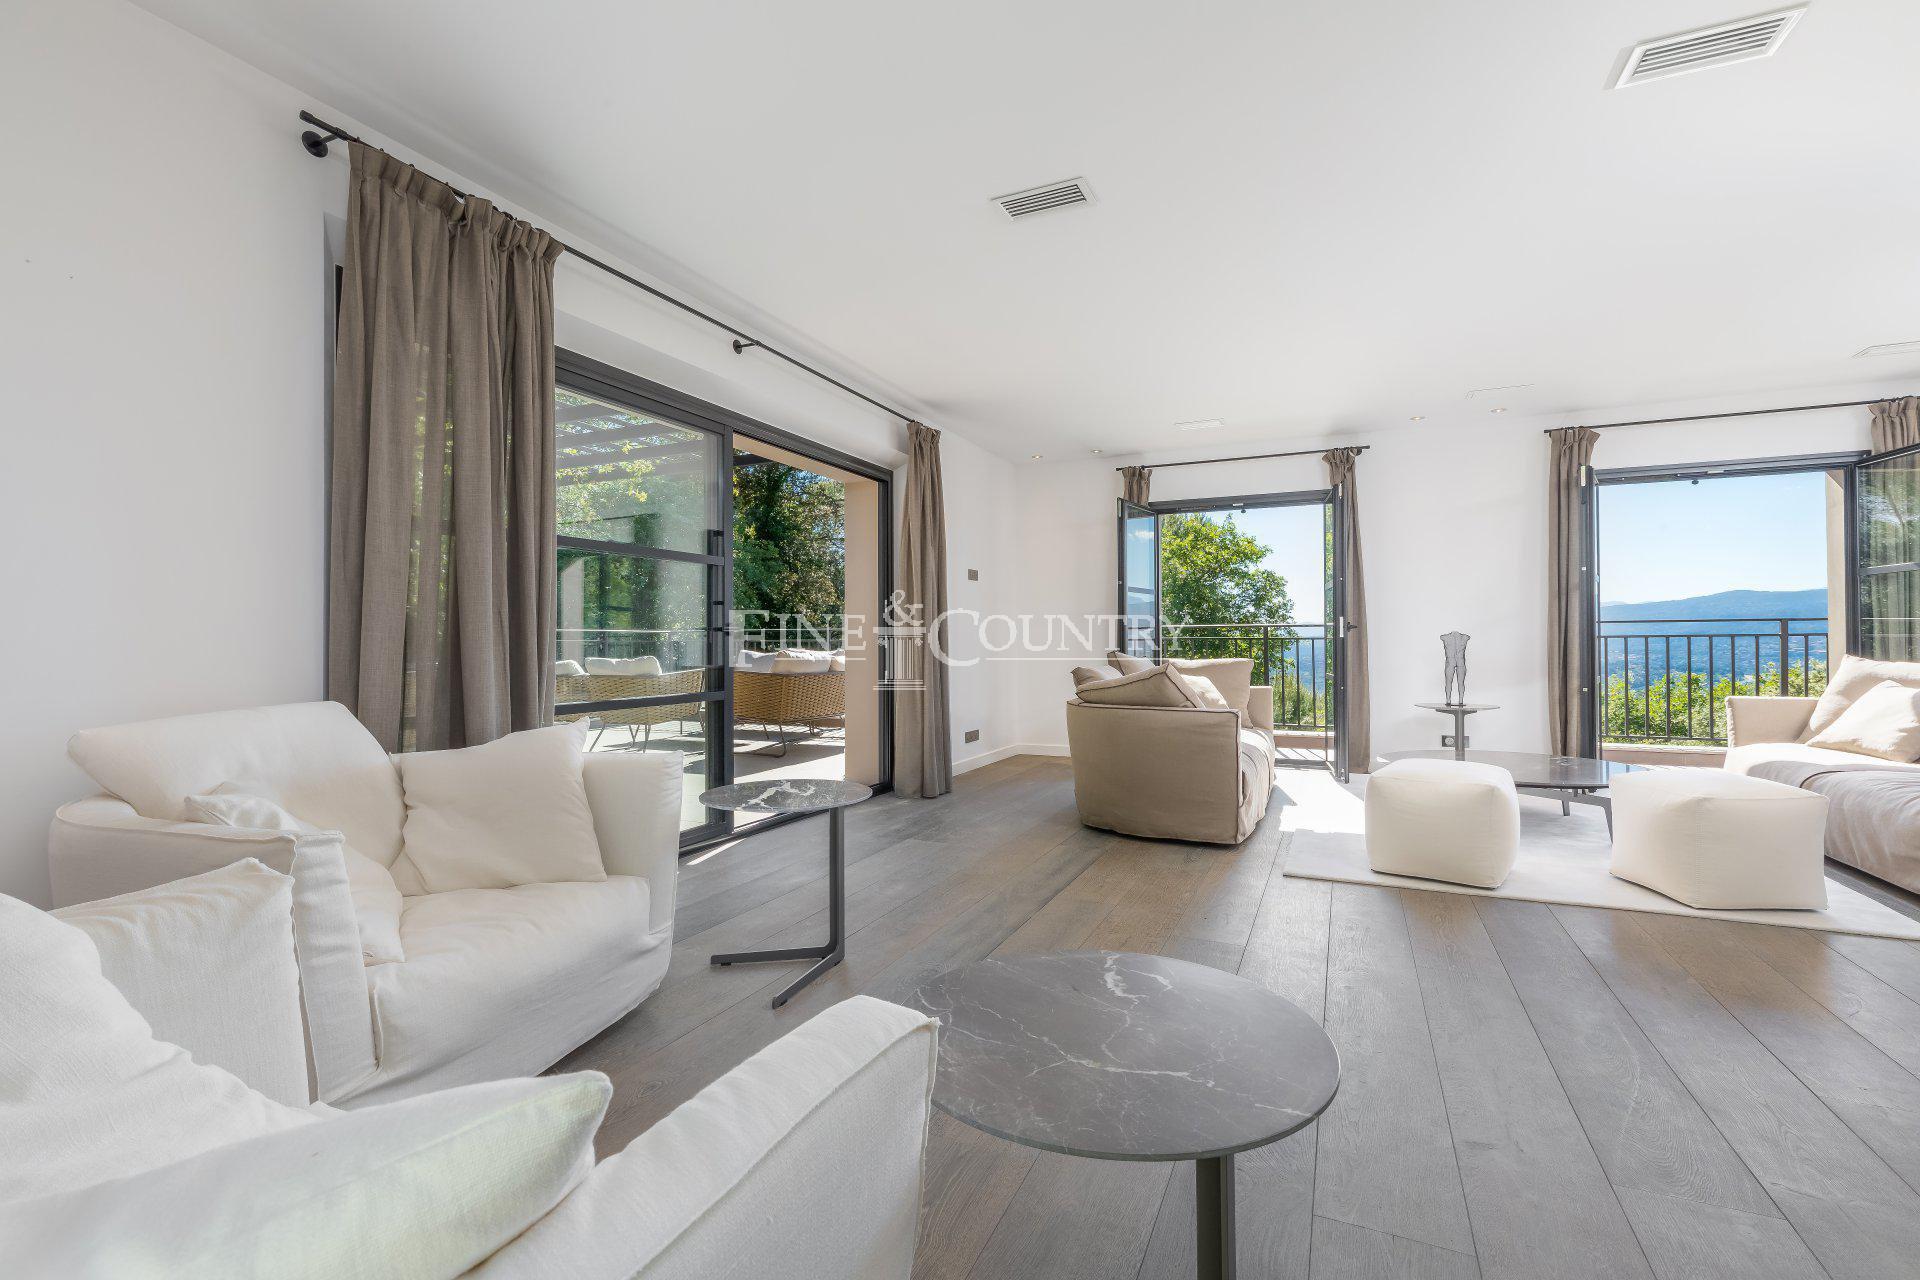 Villa for sale in Mougins Castellaras